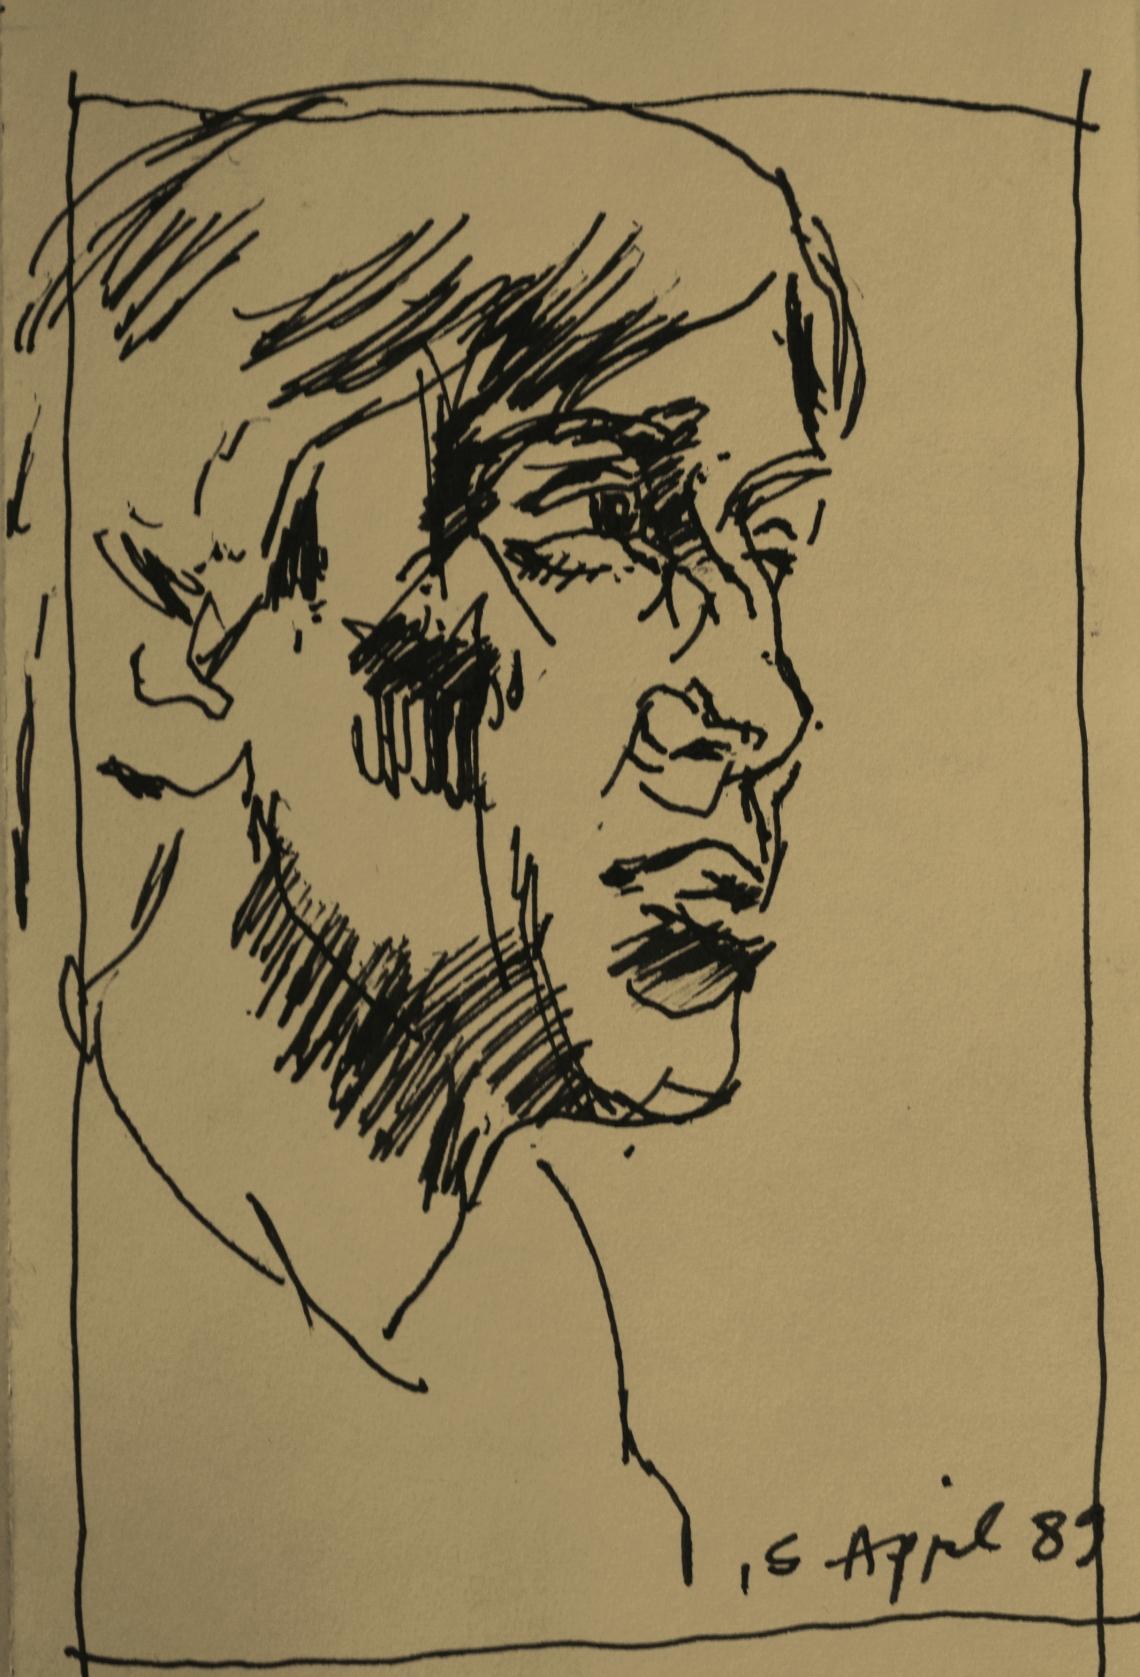 scribbled sketch of John T 1989